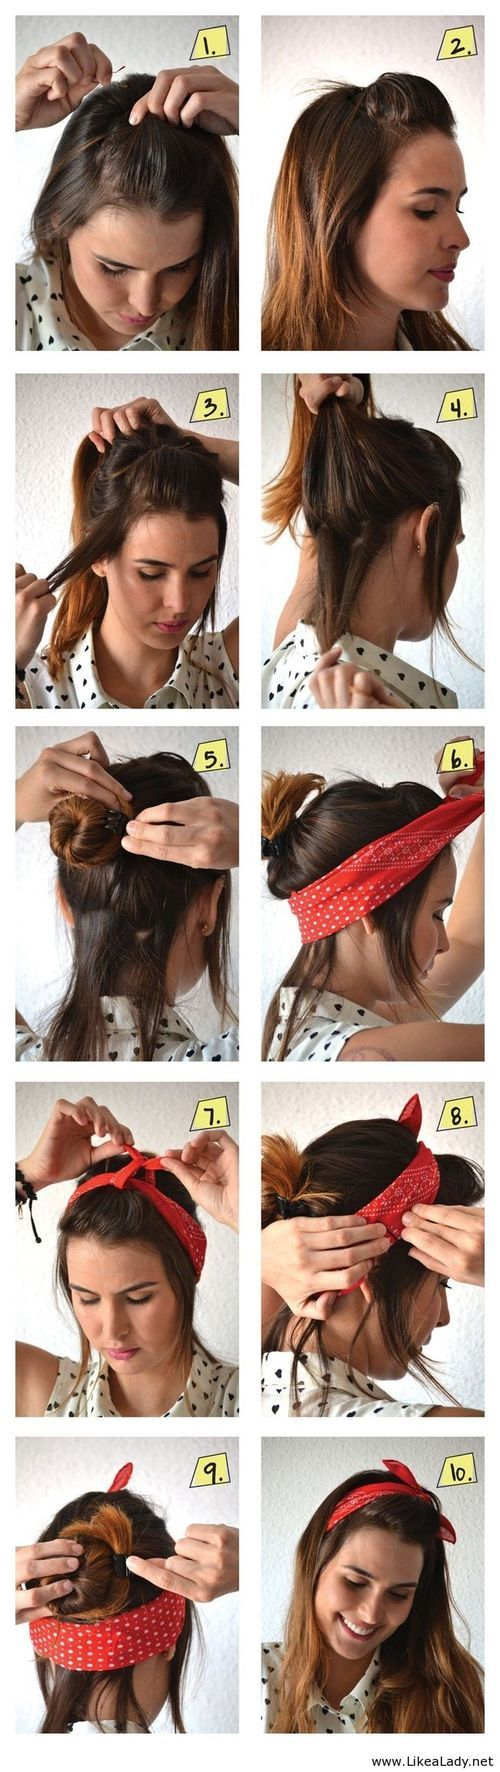 A scarf like a hair accessory - LikeaLady.net on imgfave